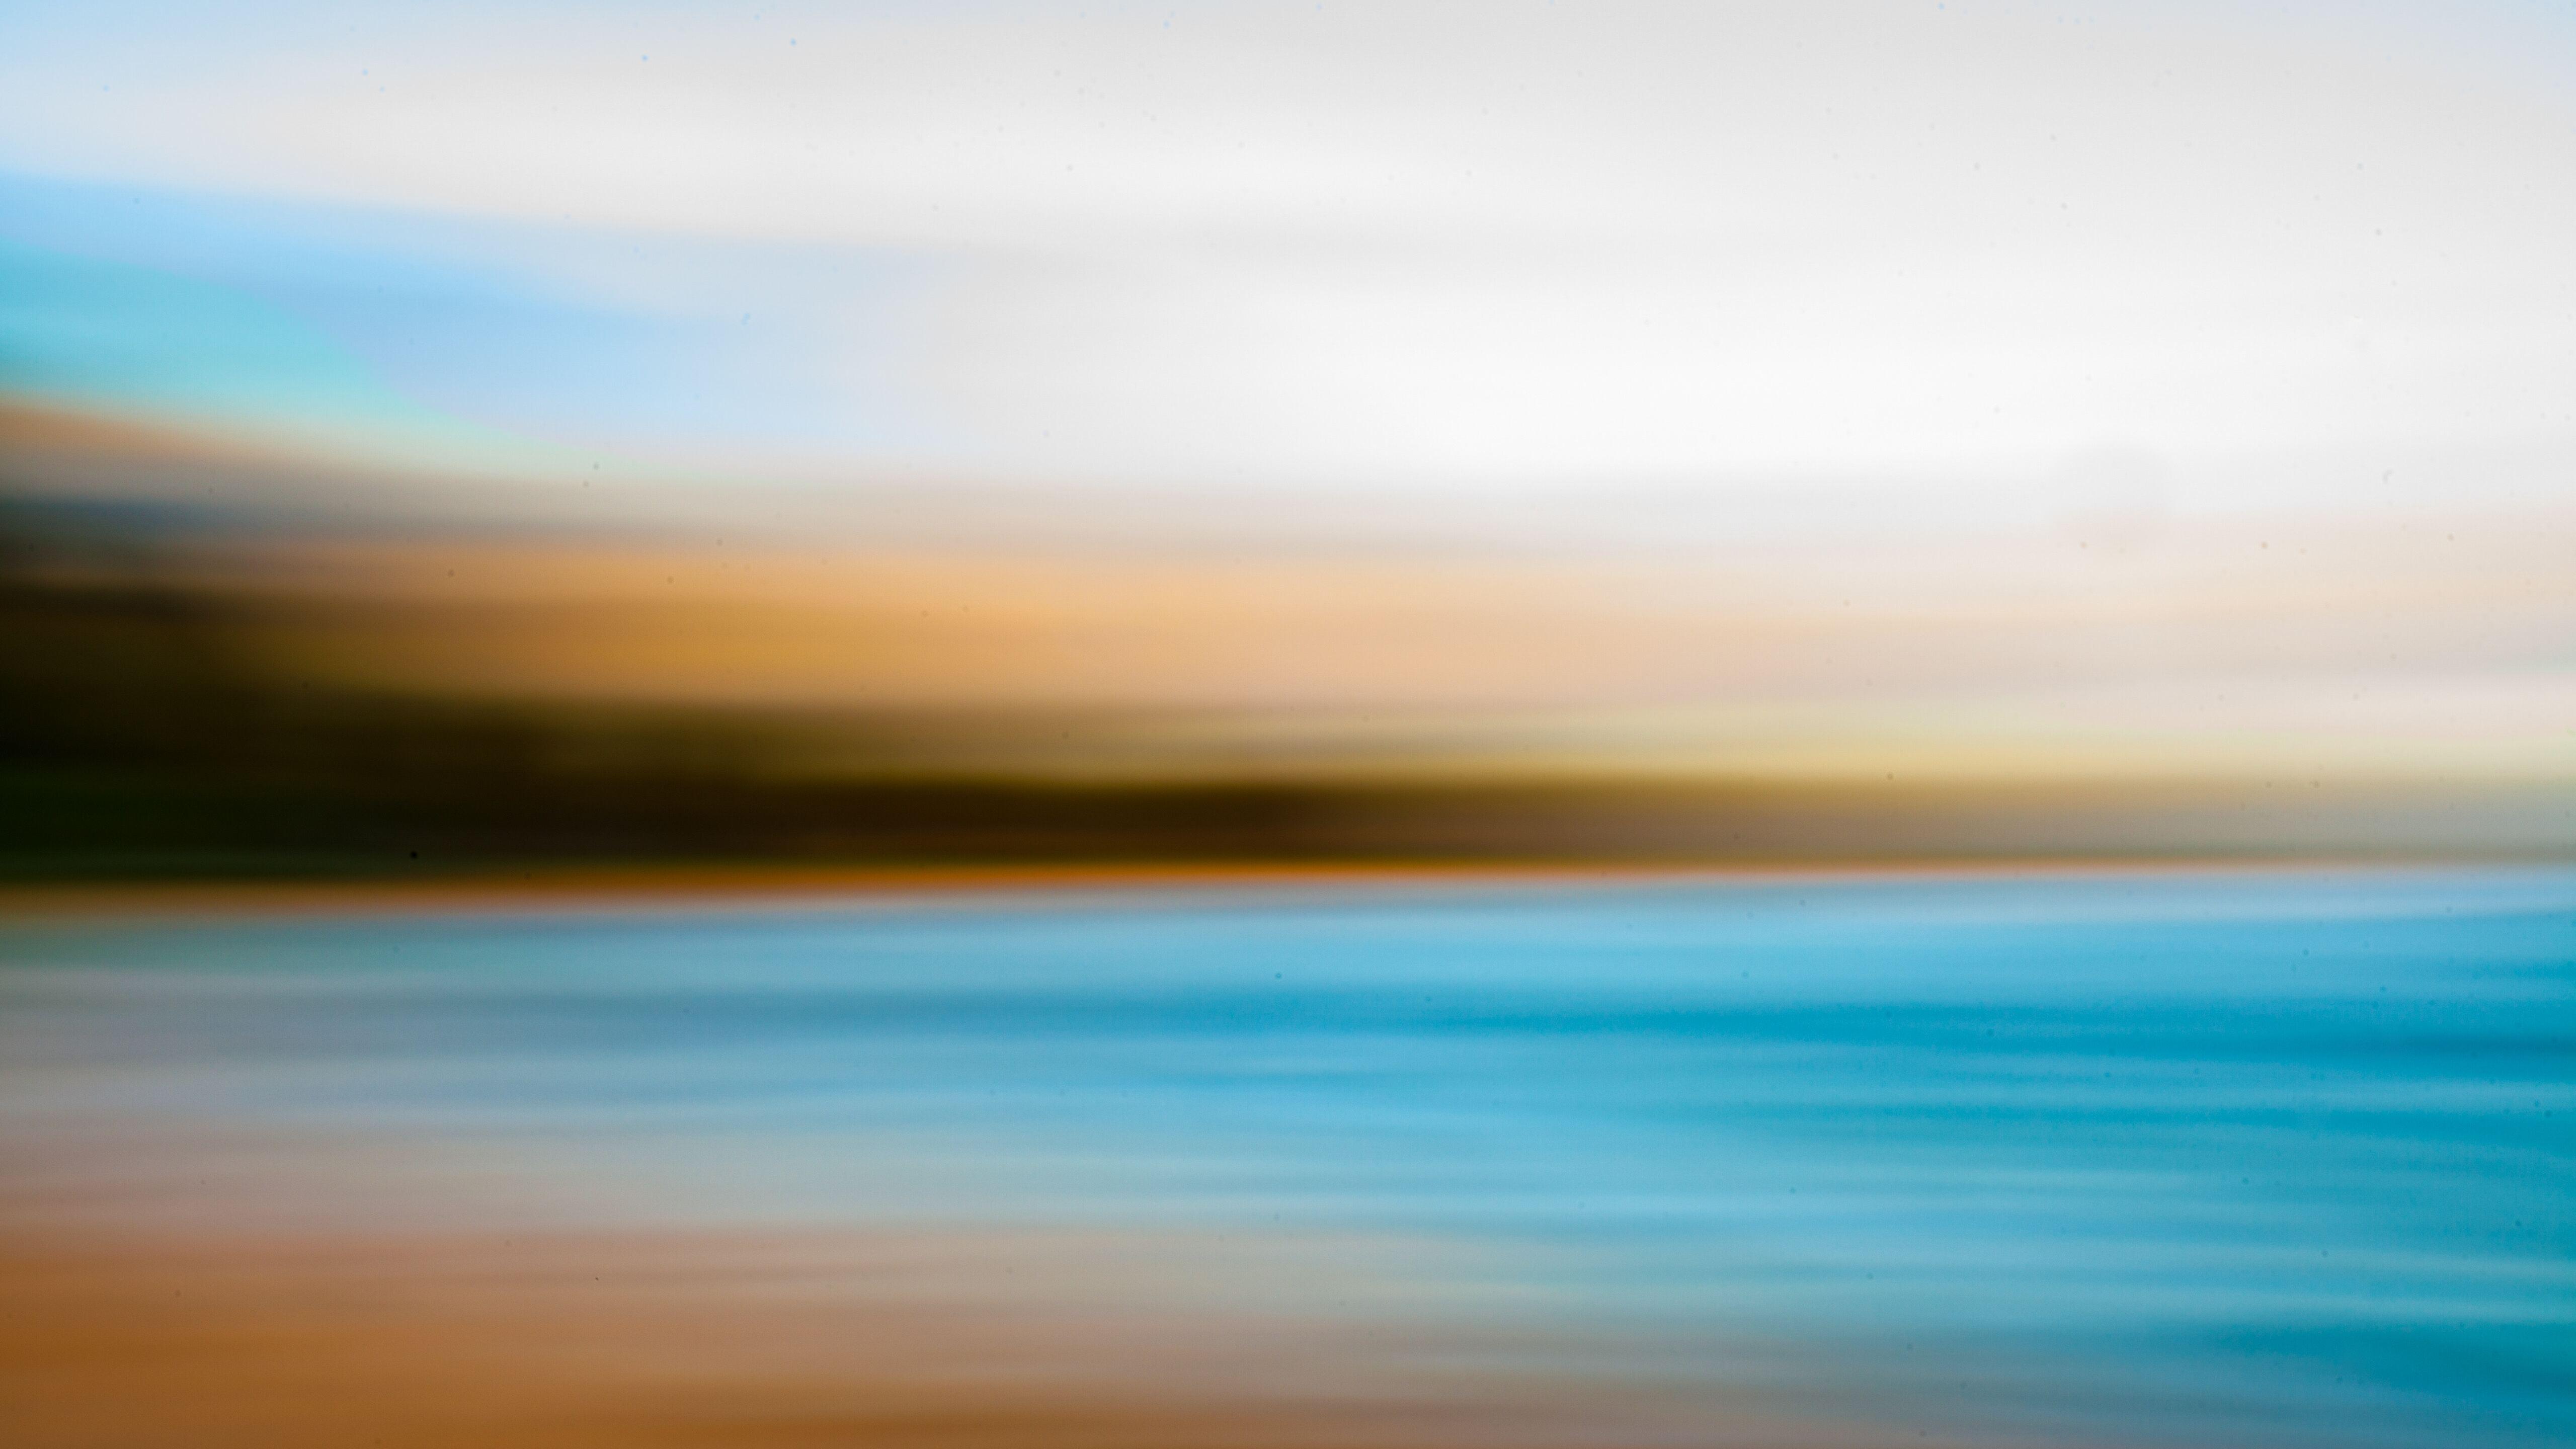 beach-abstract-5k-7c.jpg